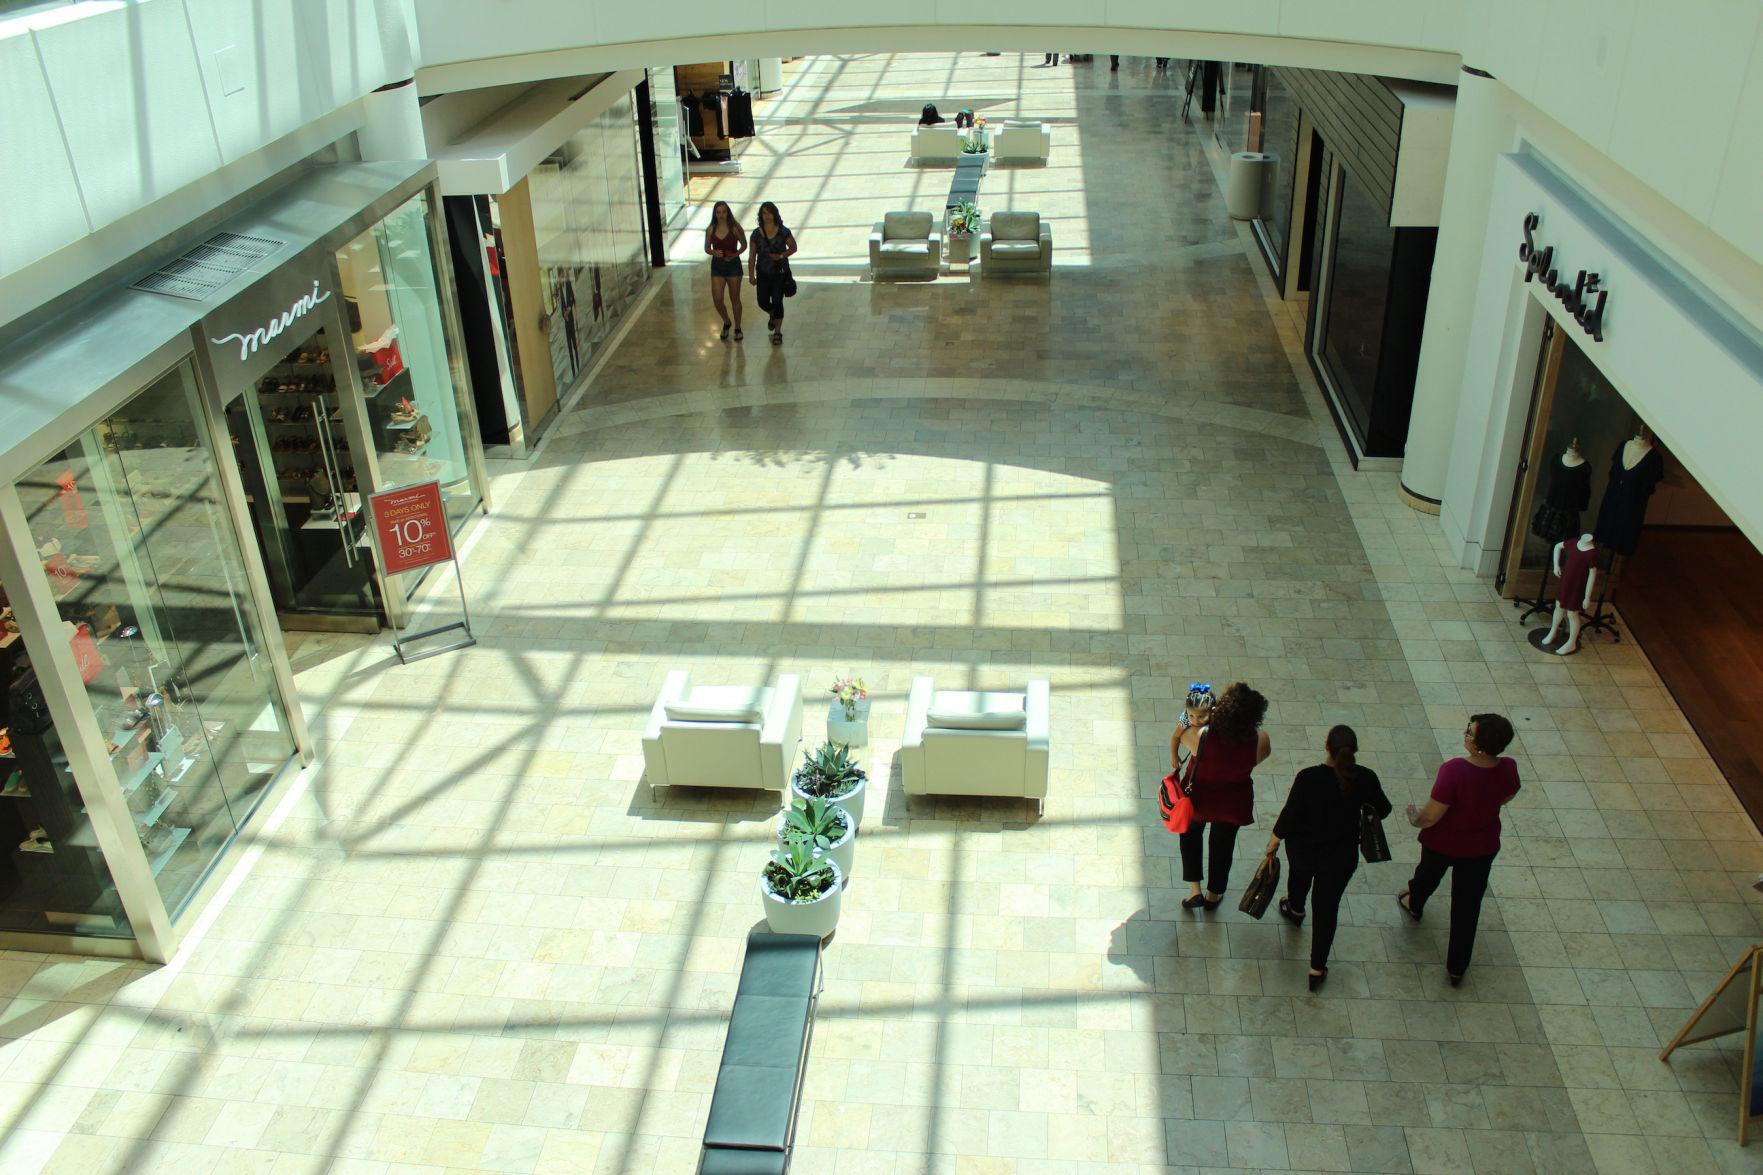 Fashion square mall harkins 33